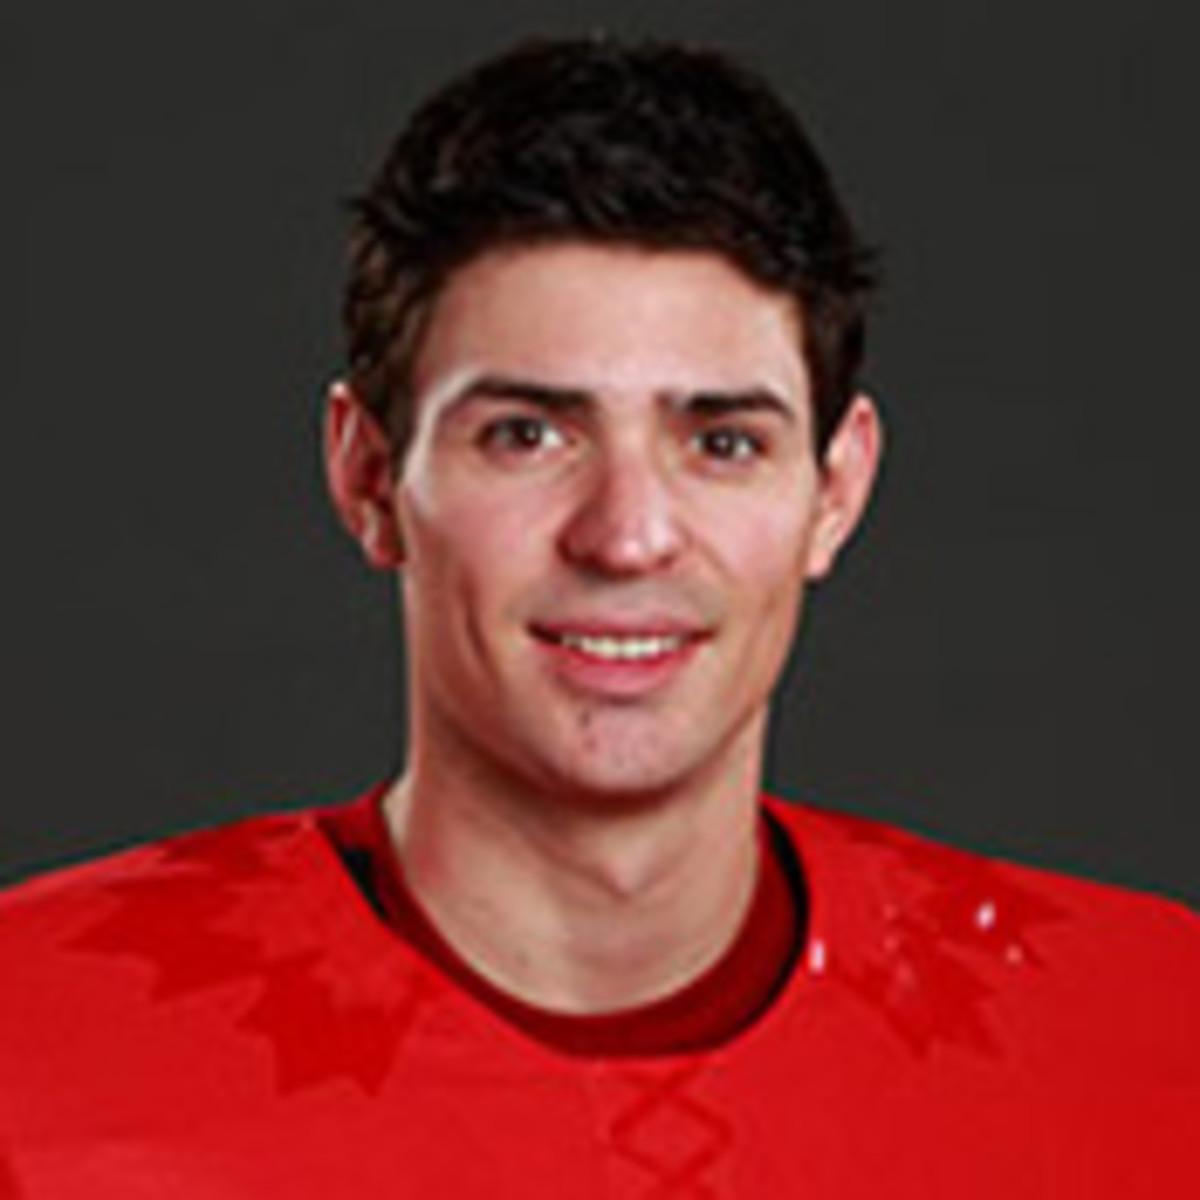 carey price 2014 canada men's hockey